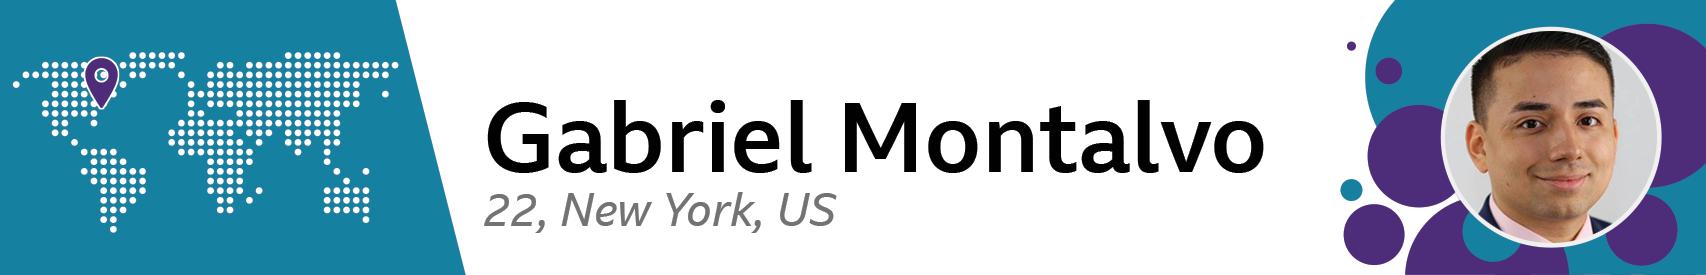 Gabriel Montalvo